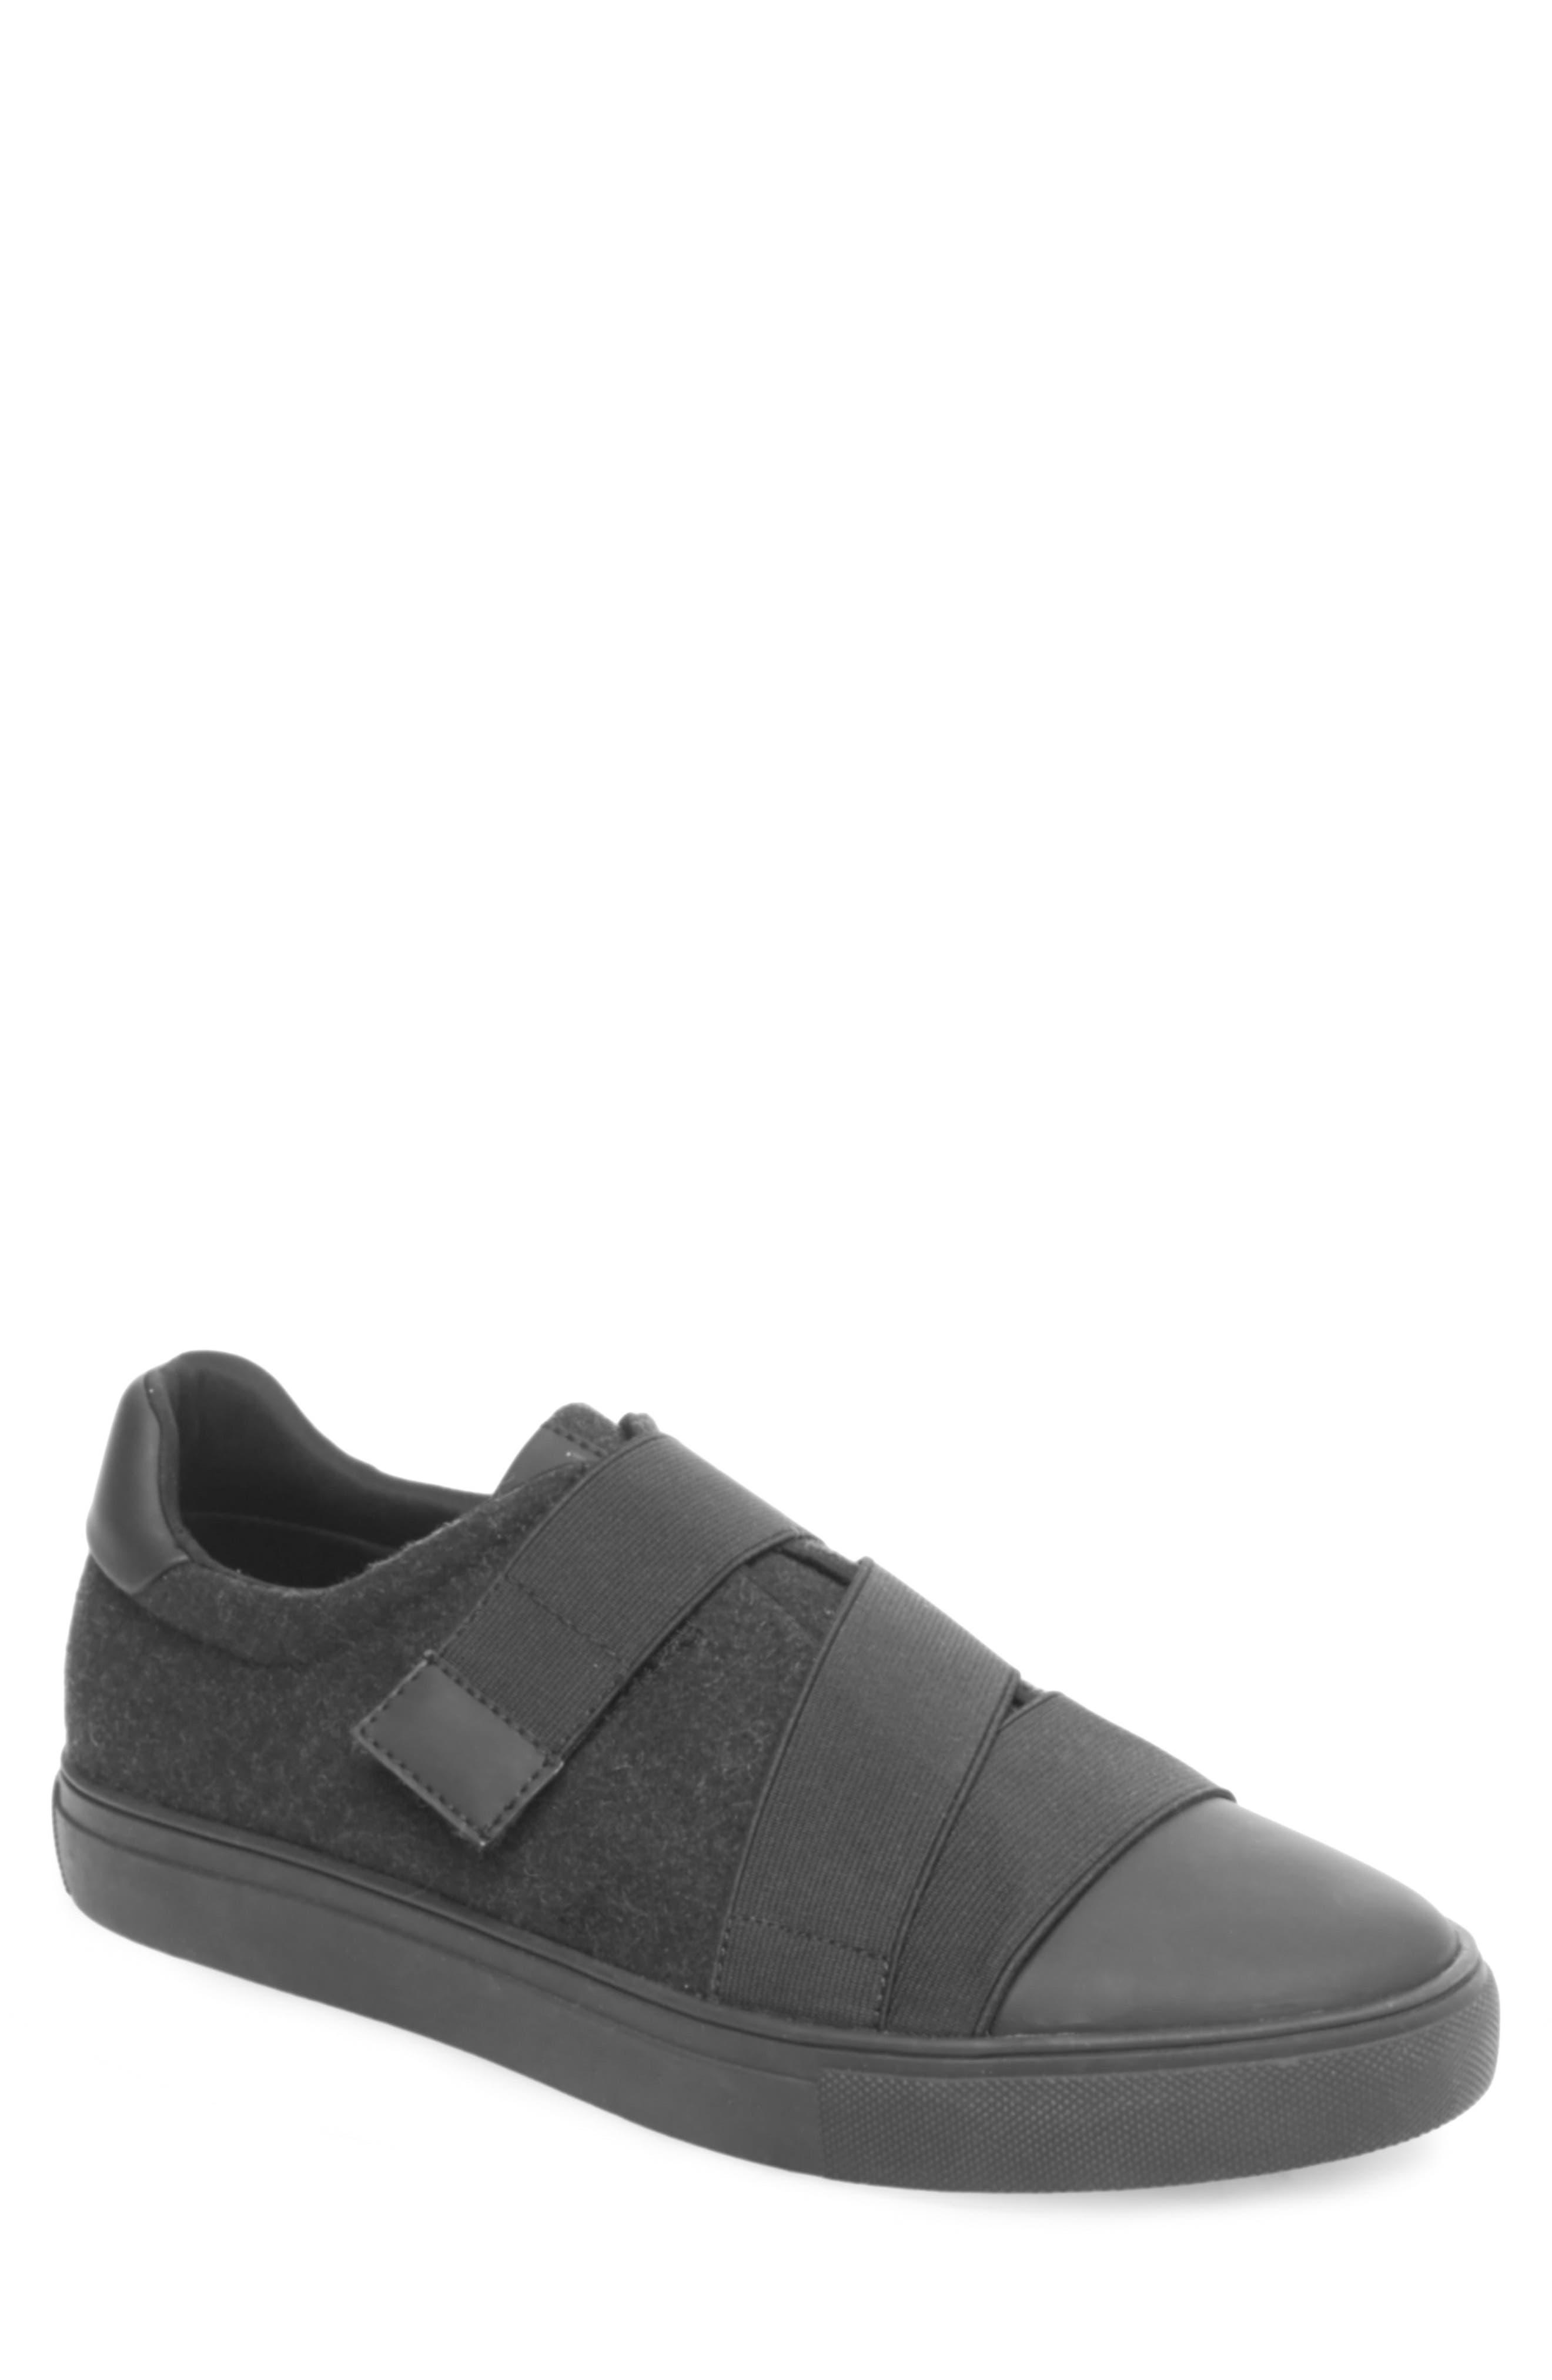 Westy Sneaker,                             Main thumbnail 1, color,                             Black